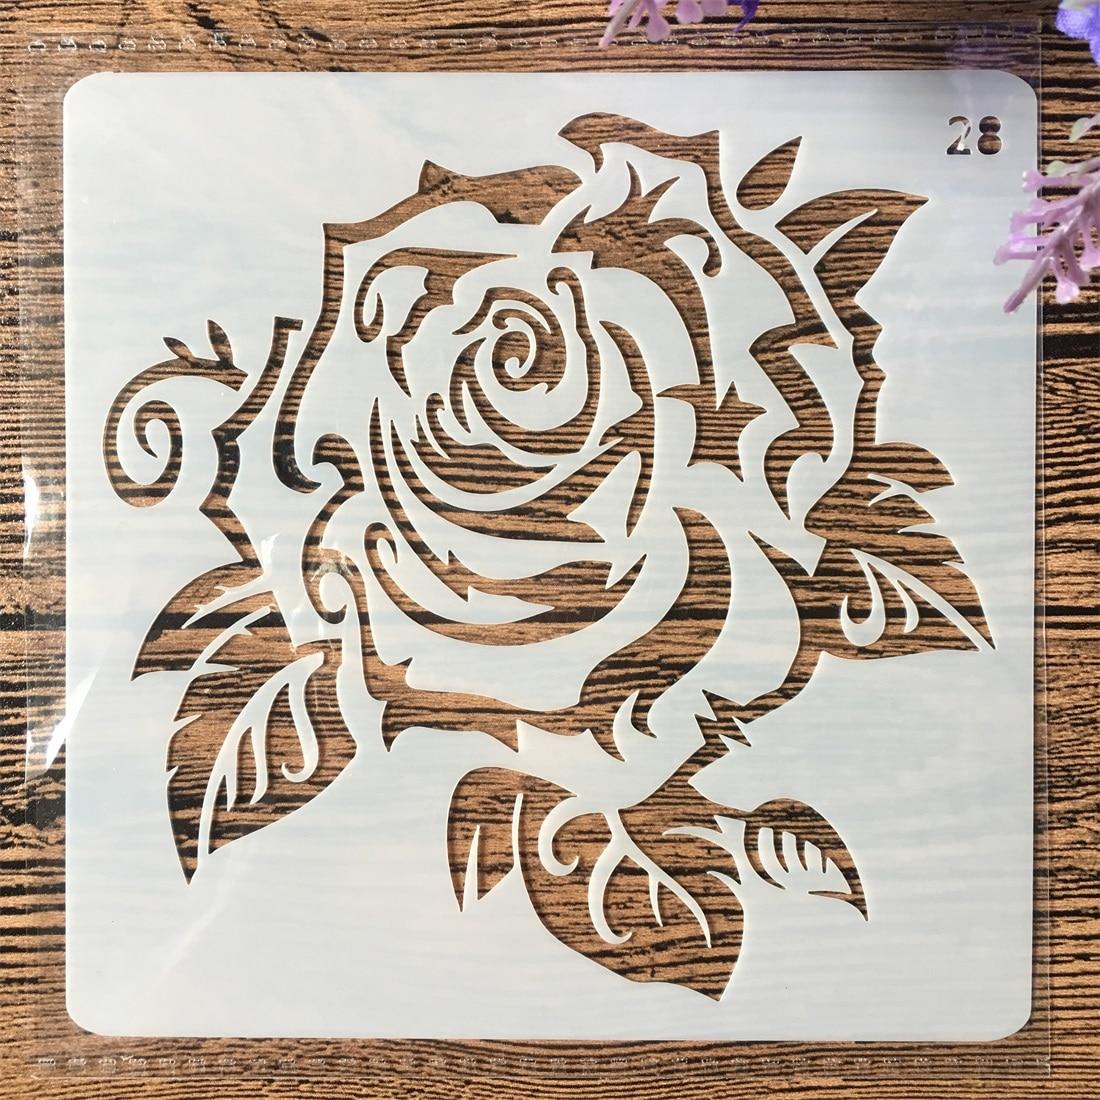 13cm Rose Flower  DIY Layering Stencils Wall Painting Scrapbook Coloring Embossing Album Decorative Card Template